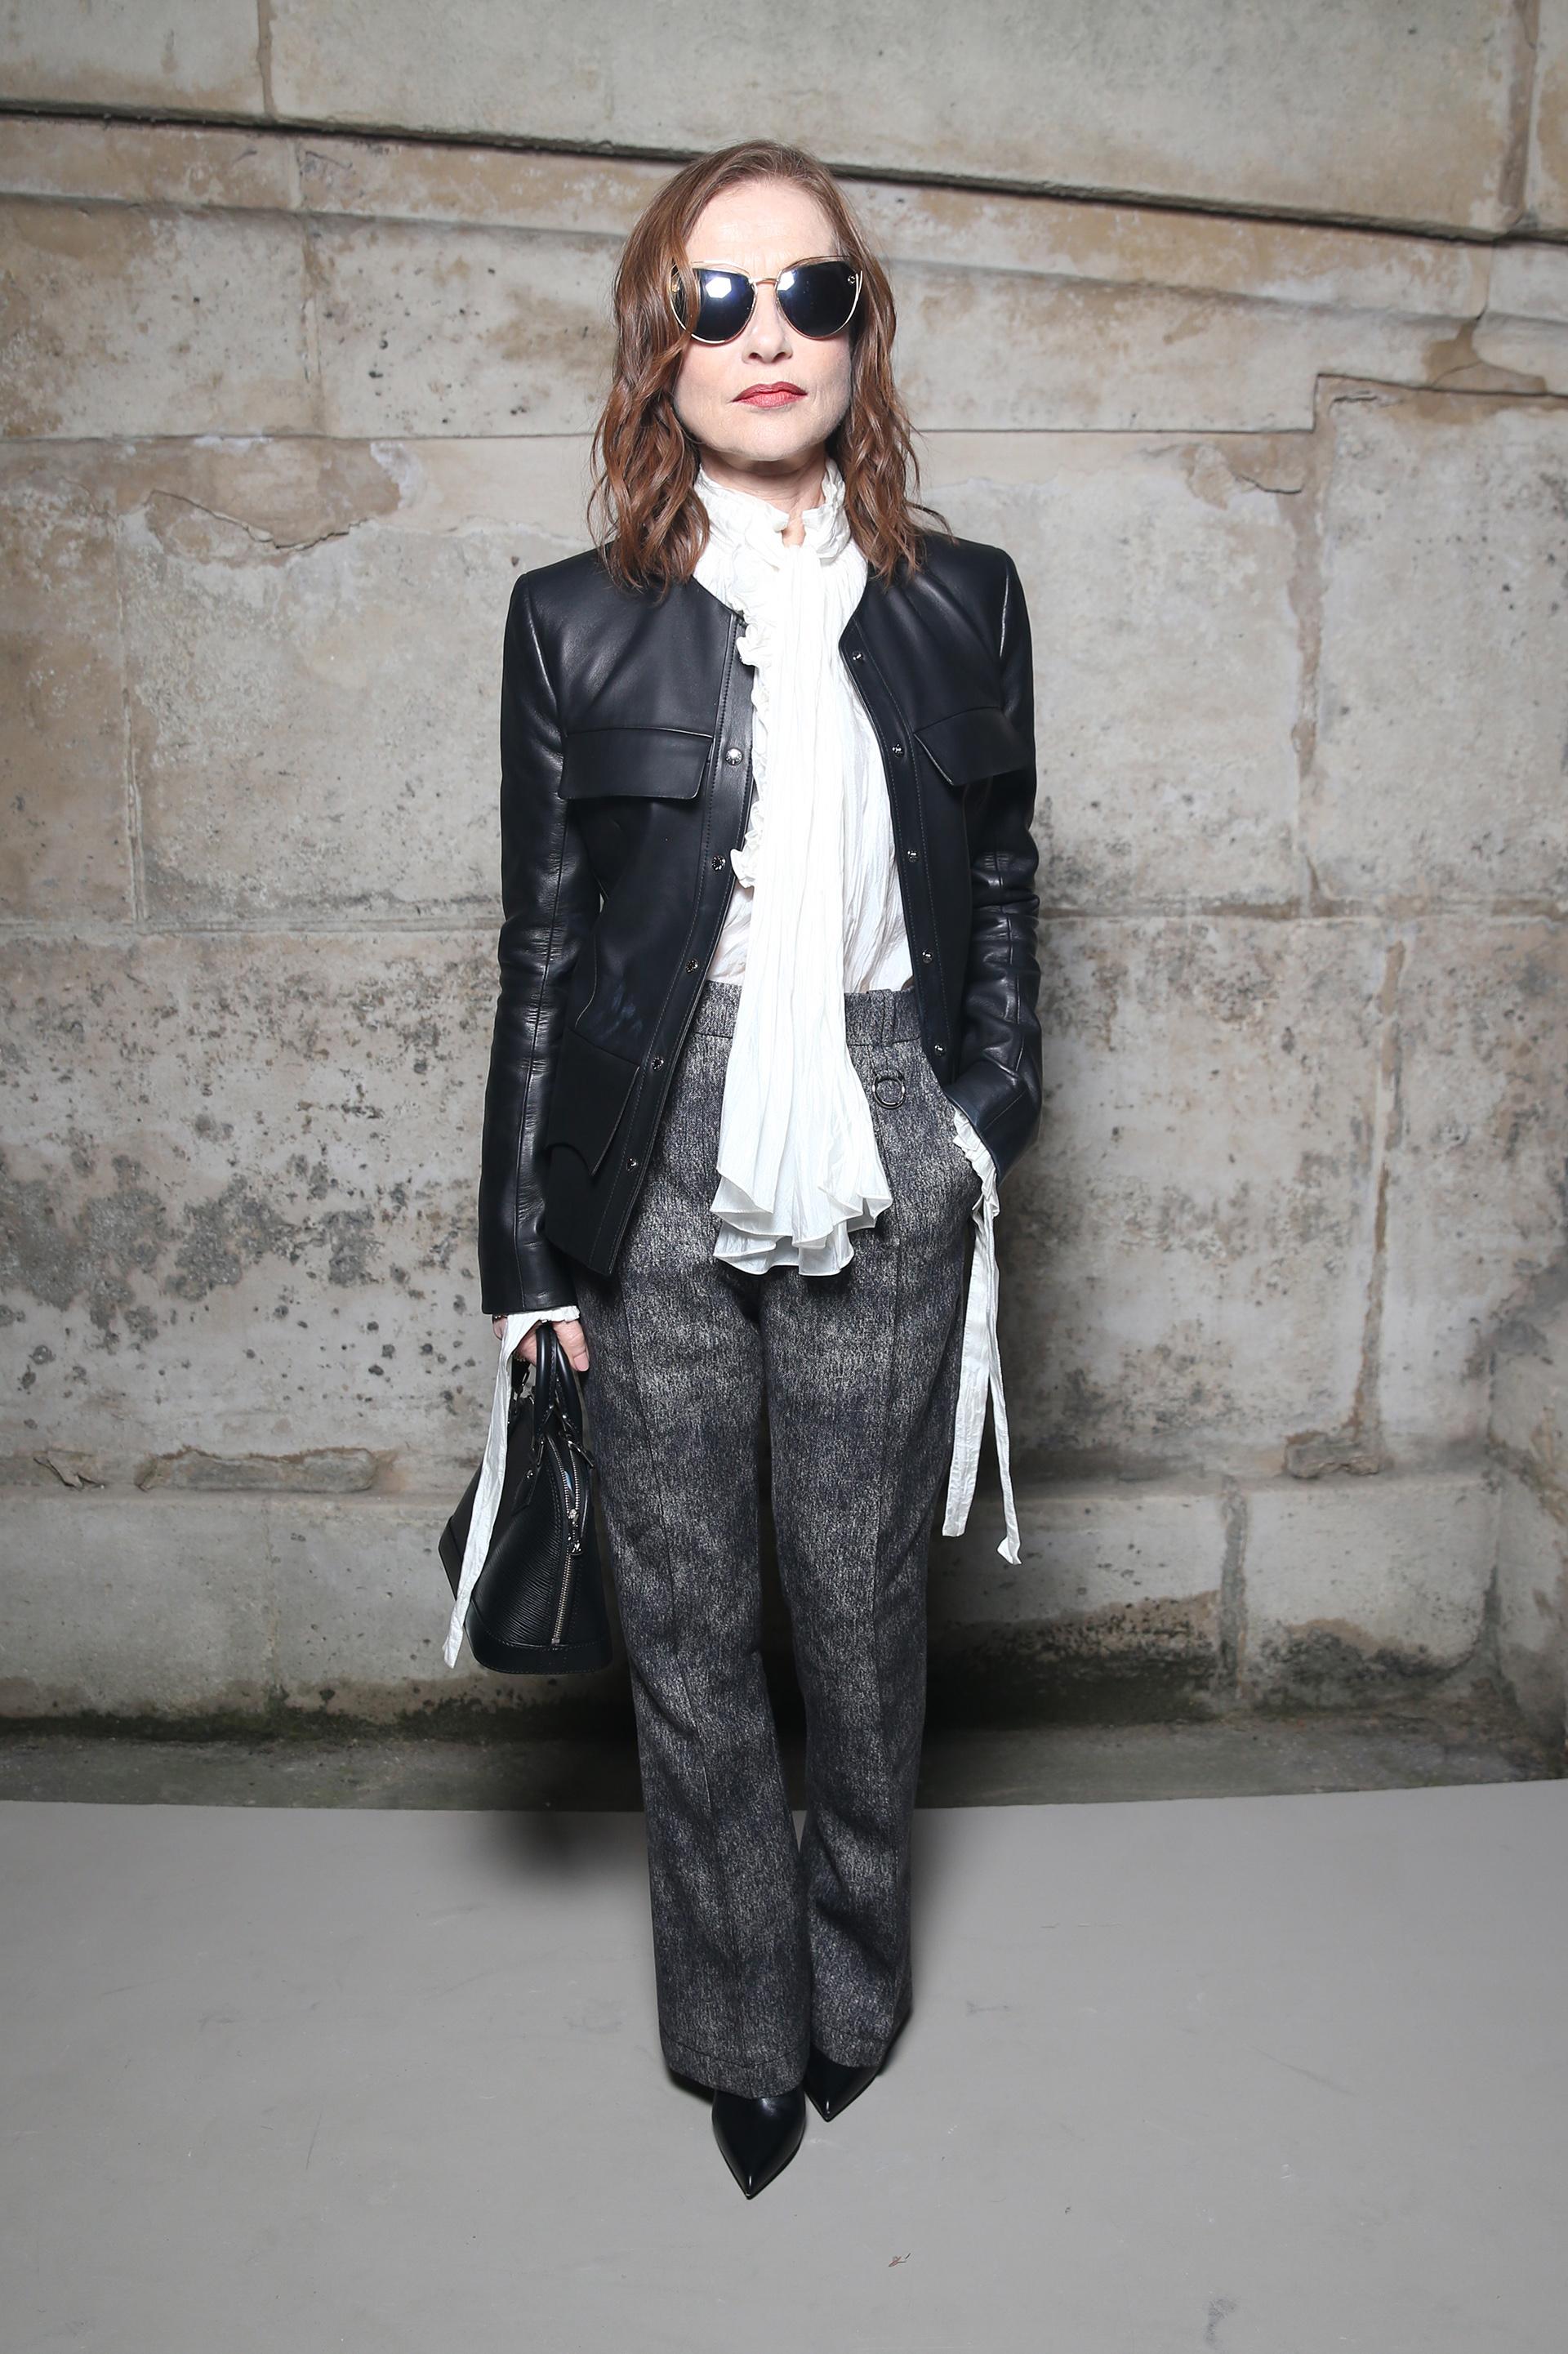 Isabelle Huppert, figura de cada presentación, optó por un look conservador en blanco y negro